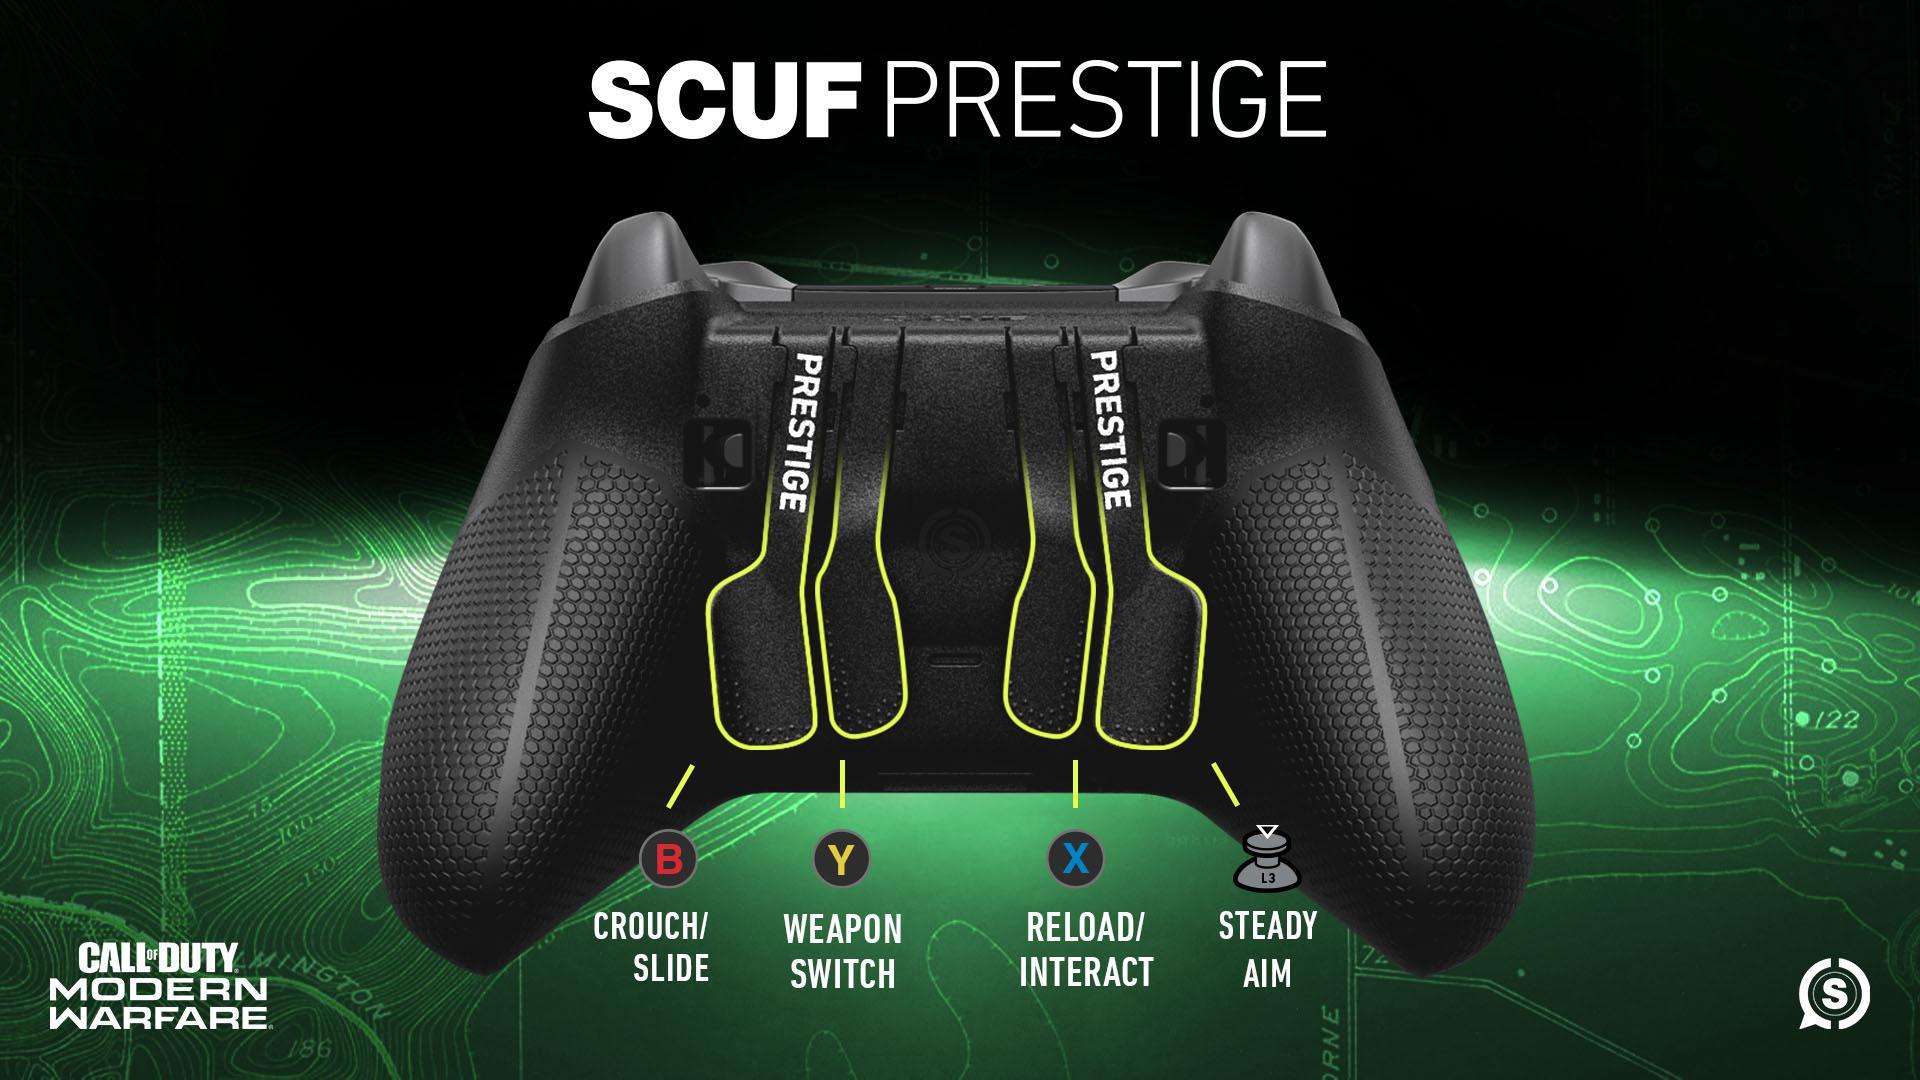 SCUF Prestige COD MW Xbox One Controller Layout